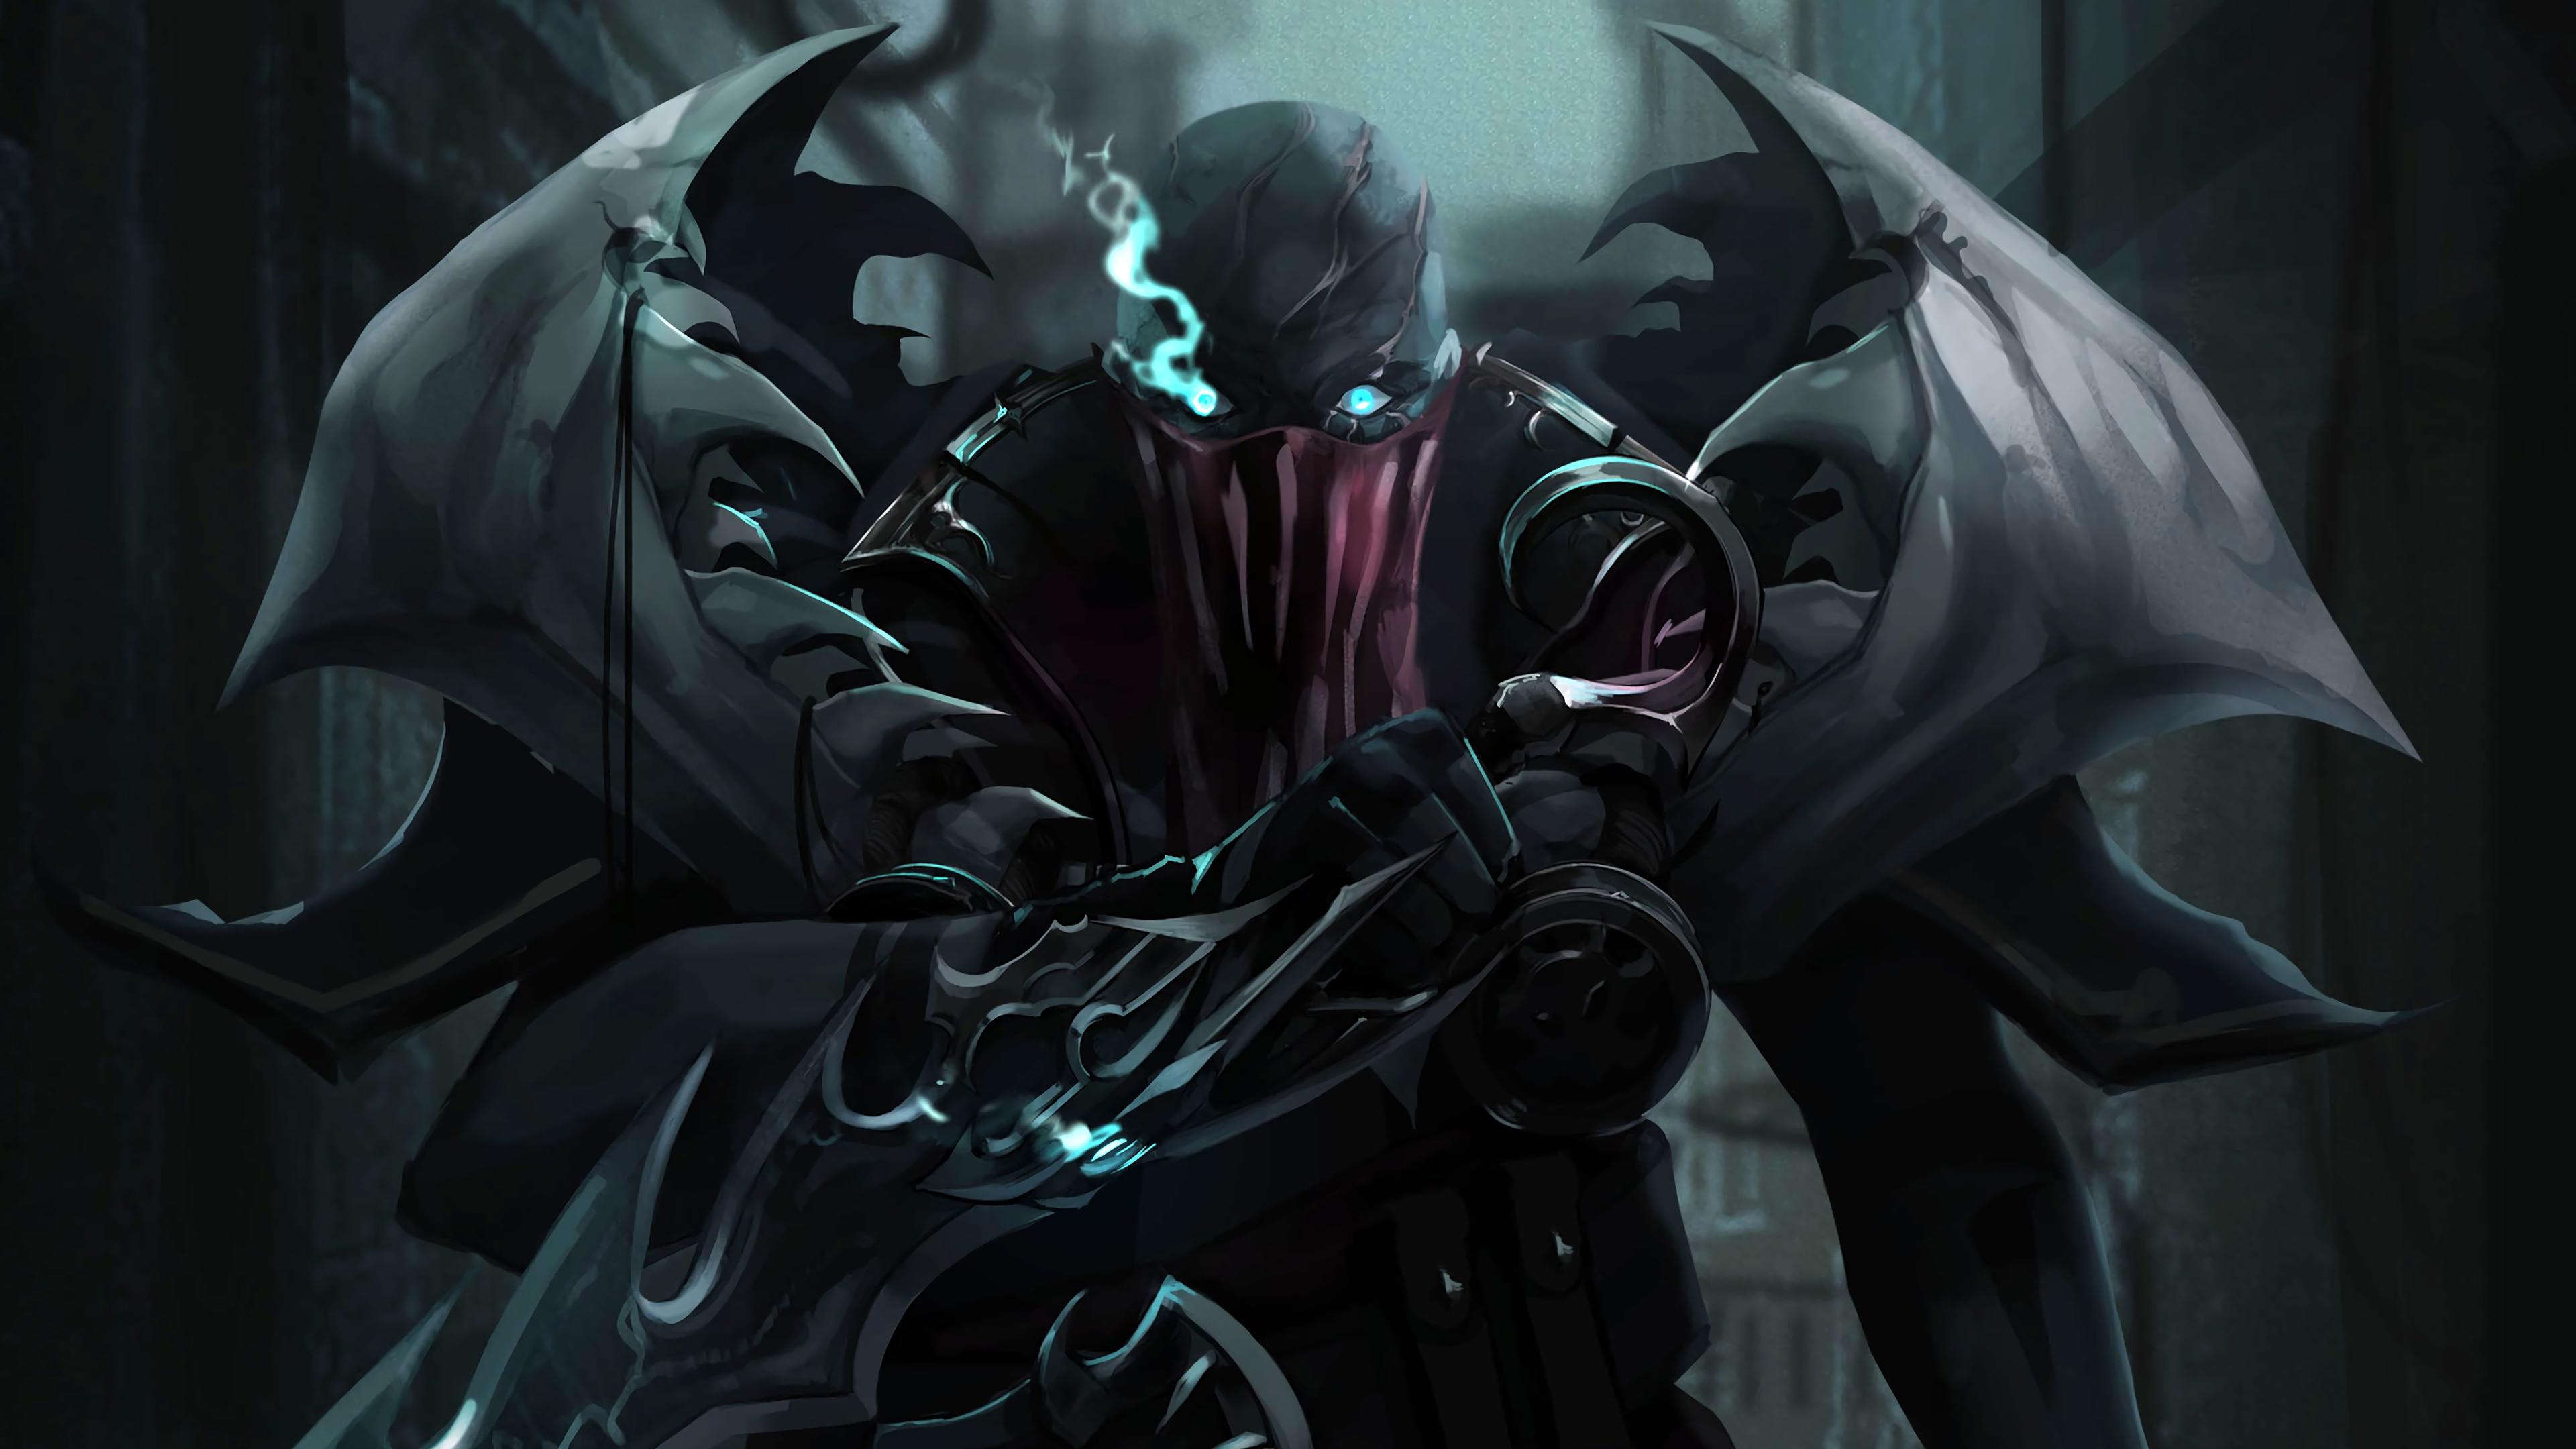 League Of Legends 4k Ultra Hd Wallpaper Background Image